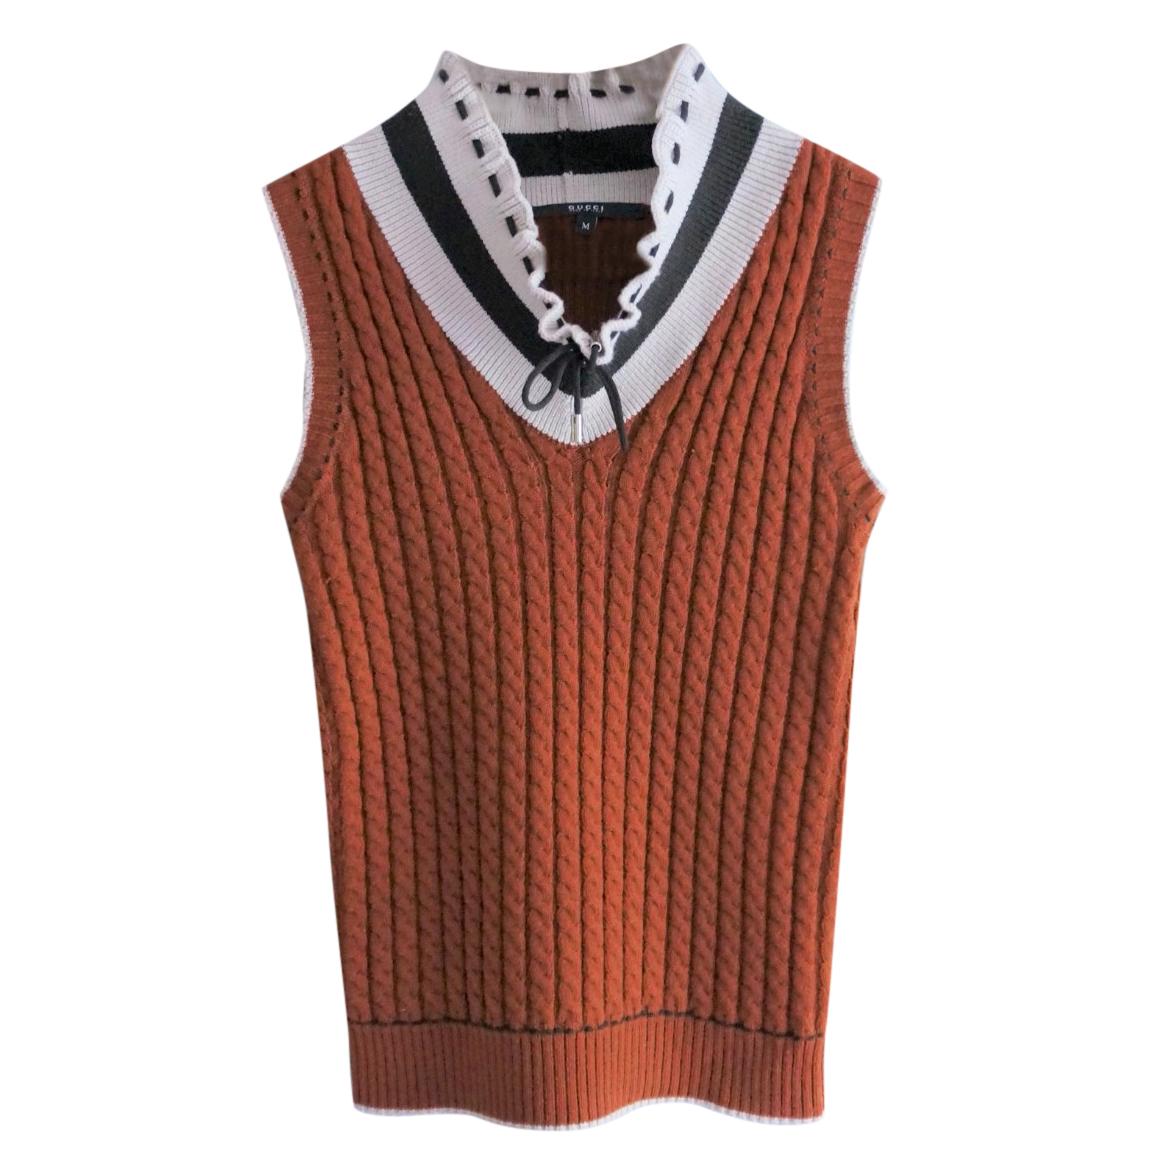 Gucci Ruffled Neck Sleeveless Ribbed Knit Vest